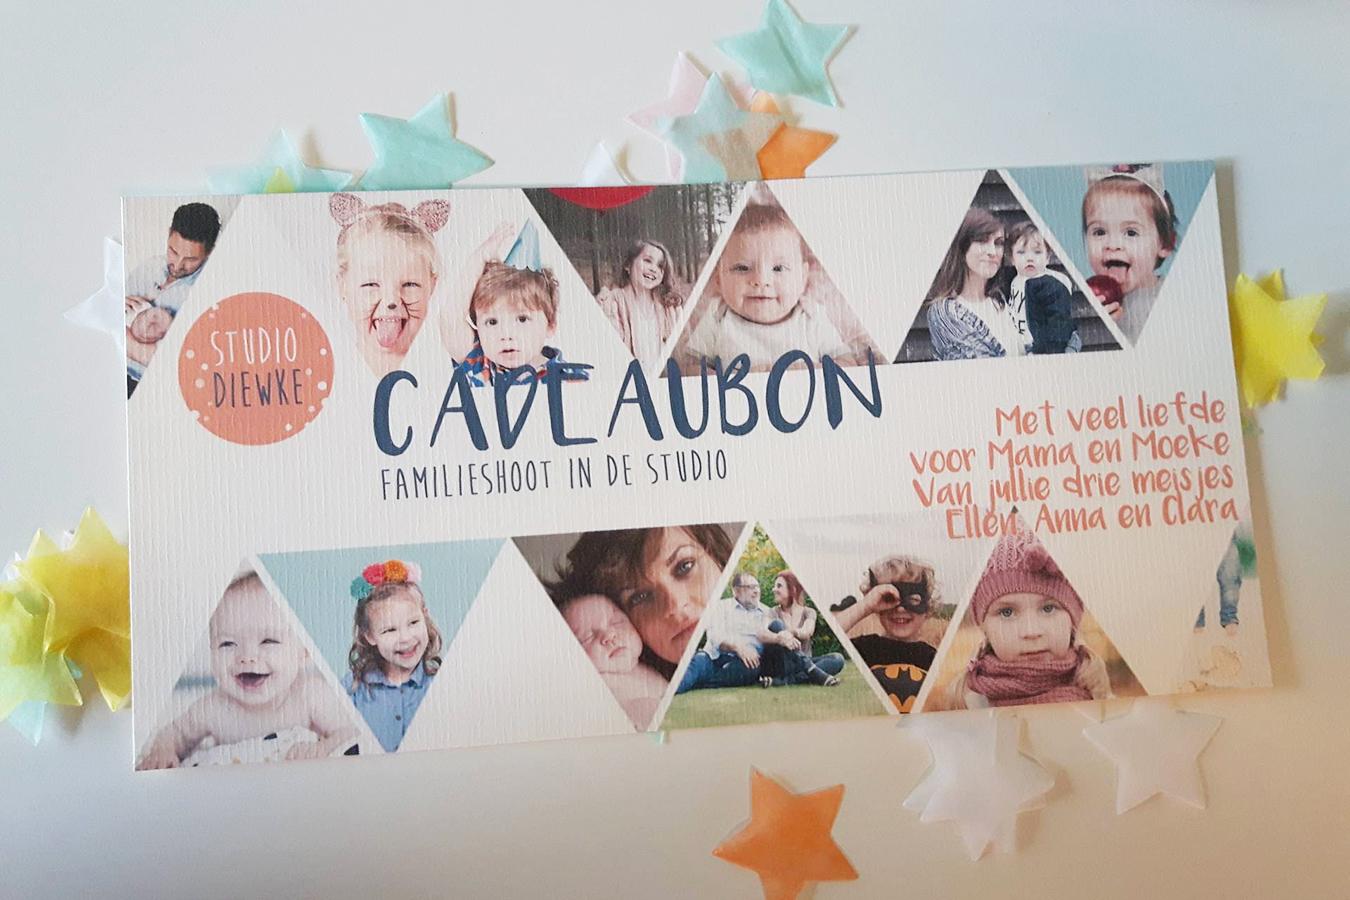 Cadeaubon Studio Diewke